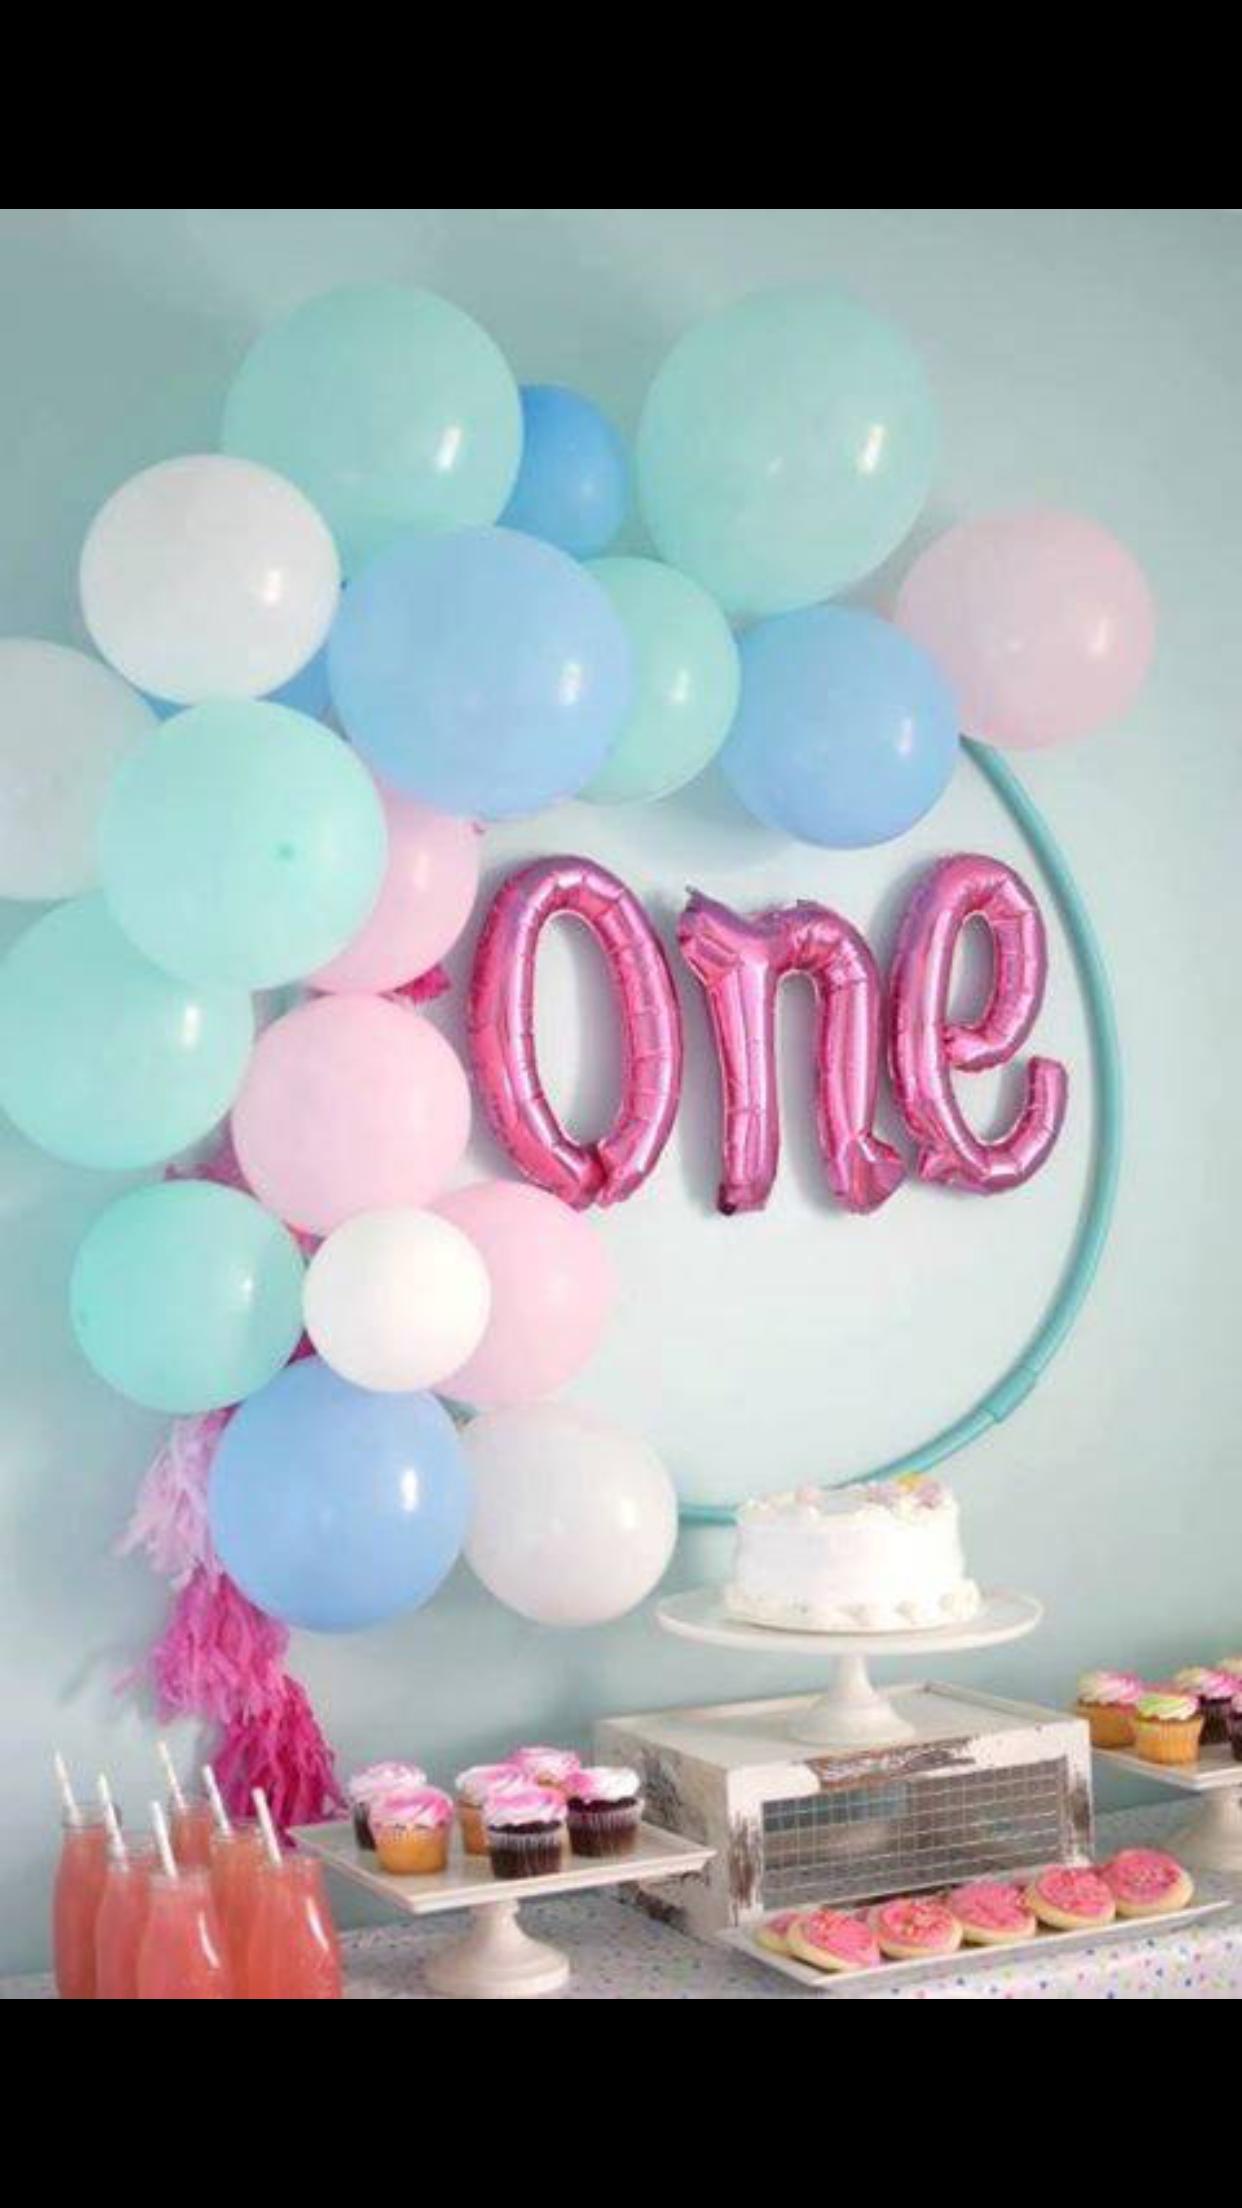 Pin by Savannah Dinsdale on Lyriks 1st Bday Pinterest Birthday